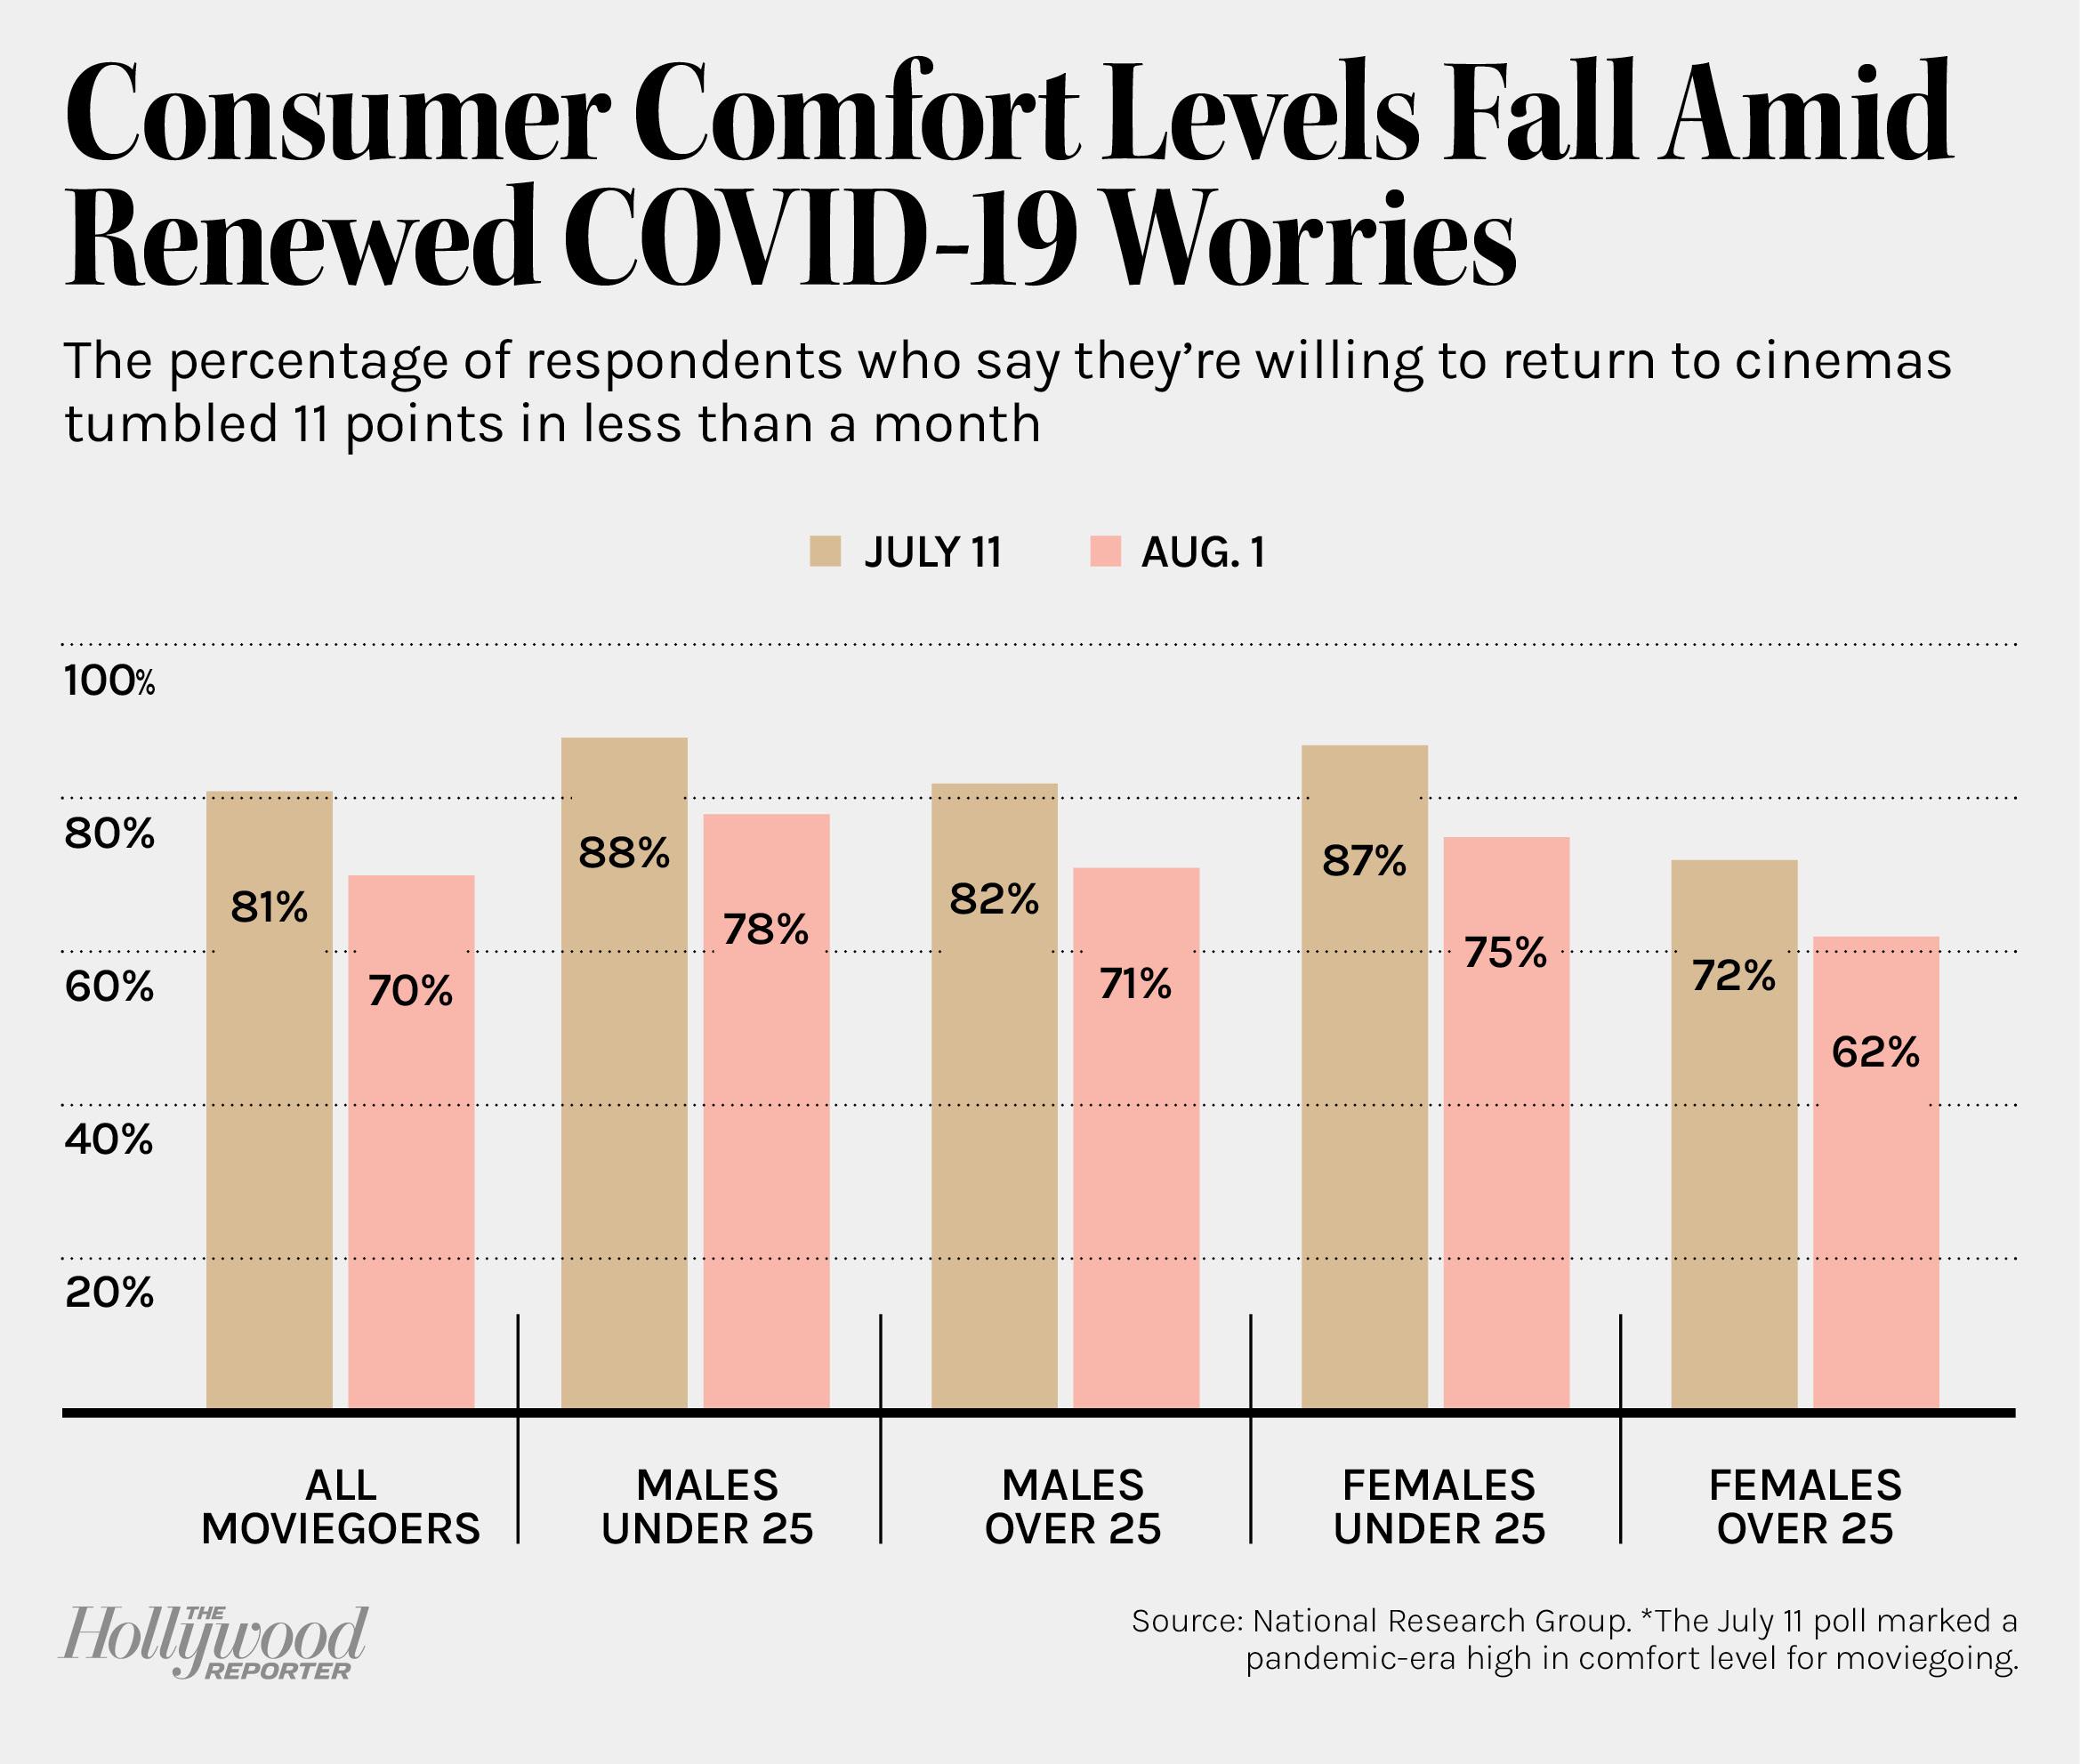 Consumer Comfort Levels Fall Amid Renewed COVID-19 Worries